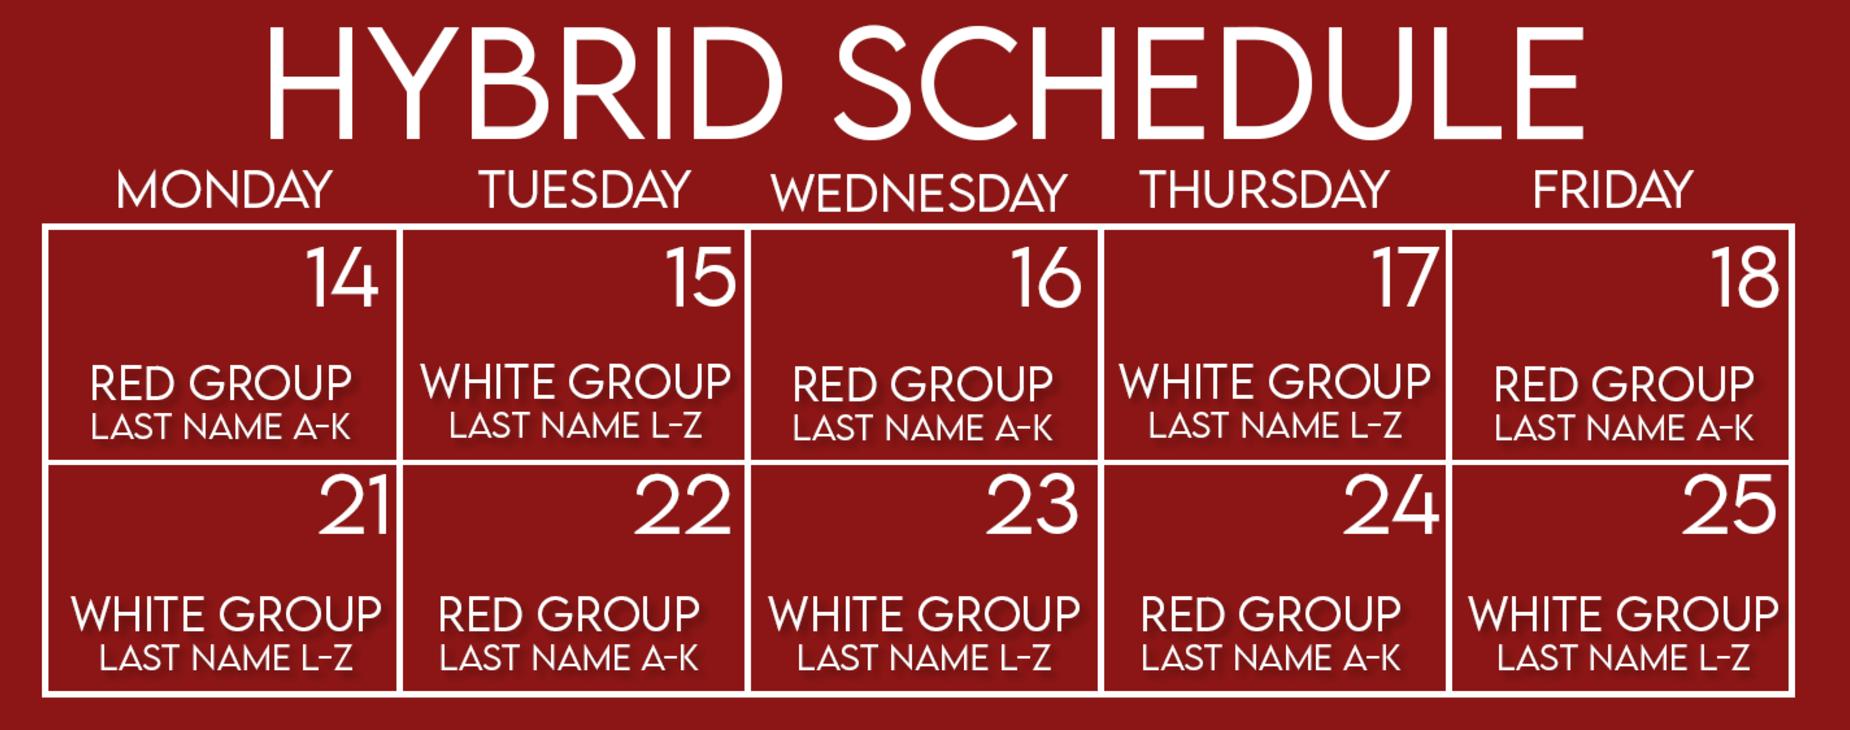 Week 3 & 4 Schedule